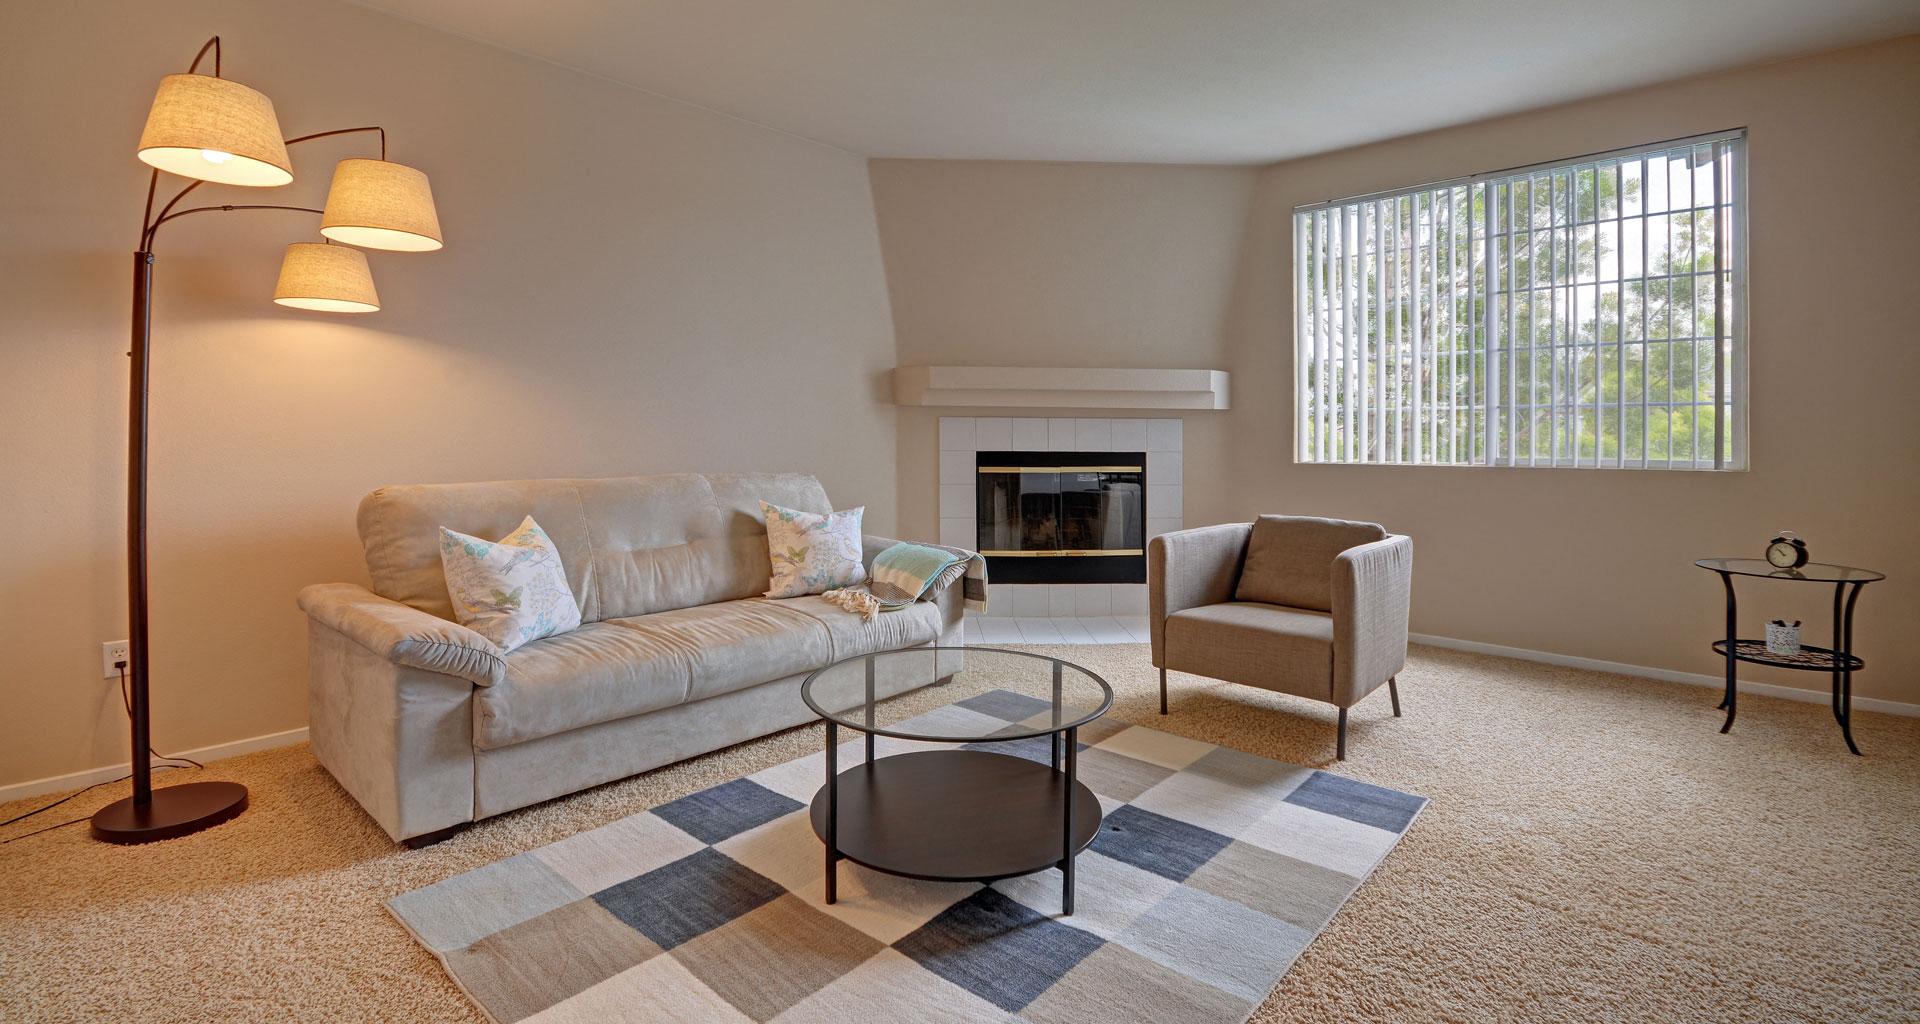 Pavona Apartments 760 N. 7th Street San Jose CA 95112 has & Pavona Apartments by Windsor | San Jose Luxury Apartments | Home